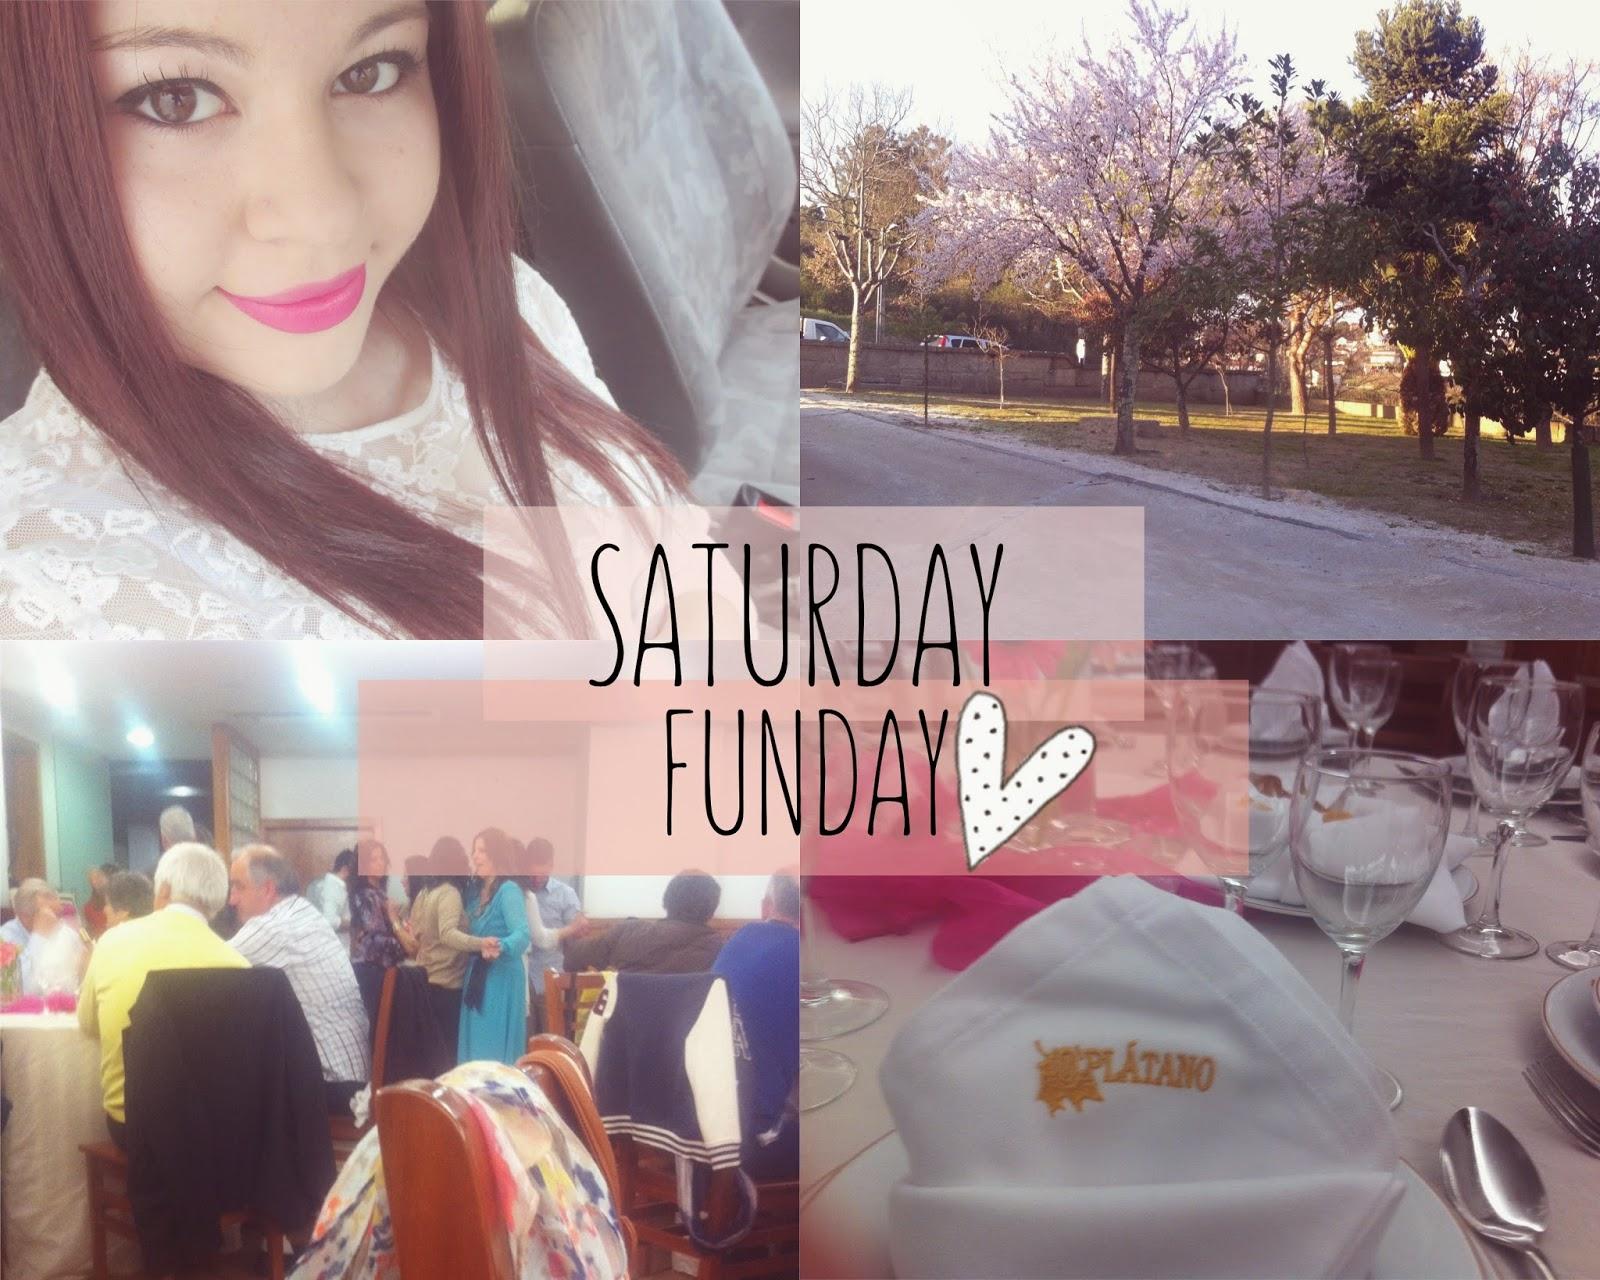 Saturday Funday!